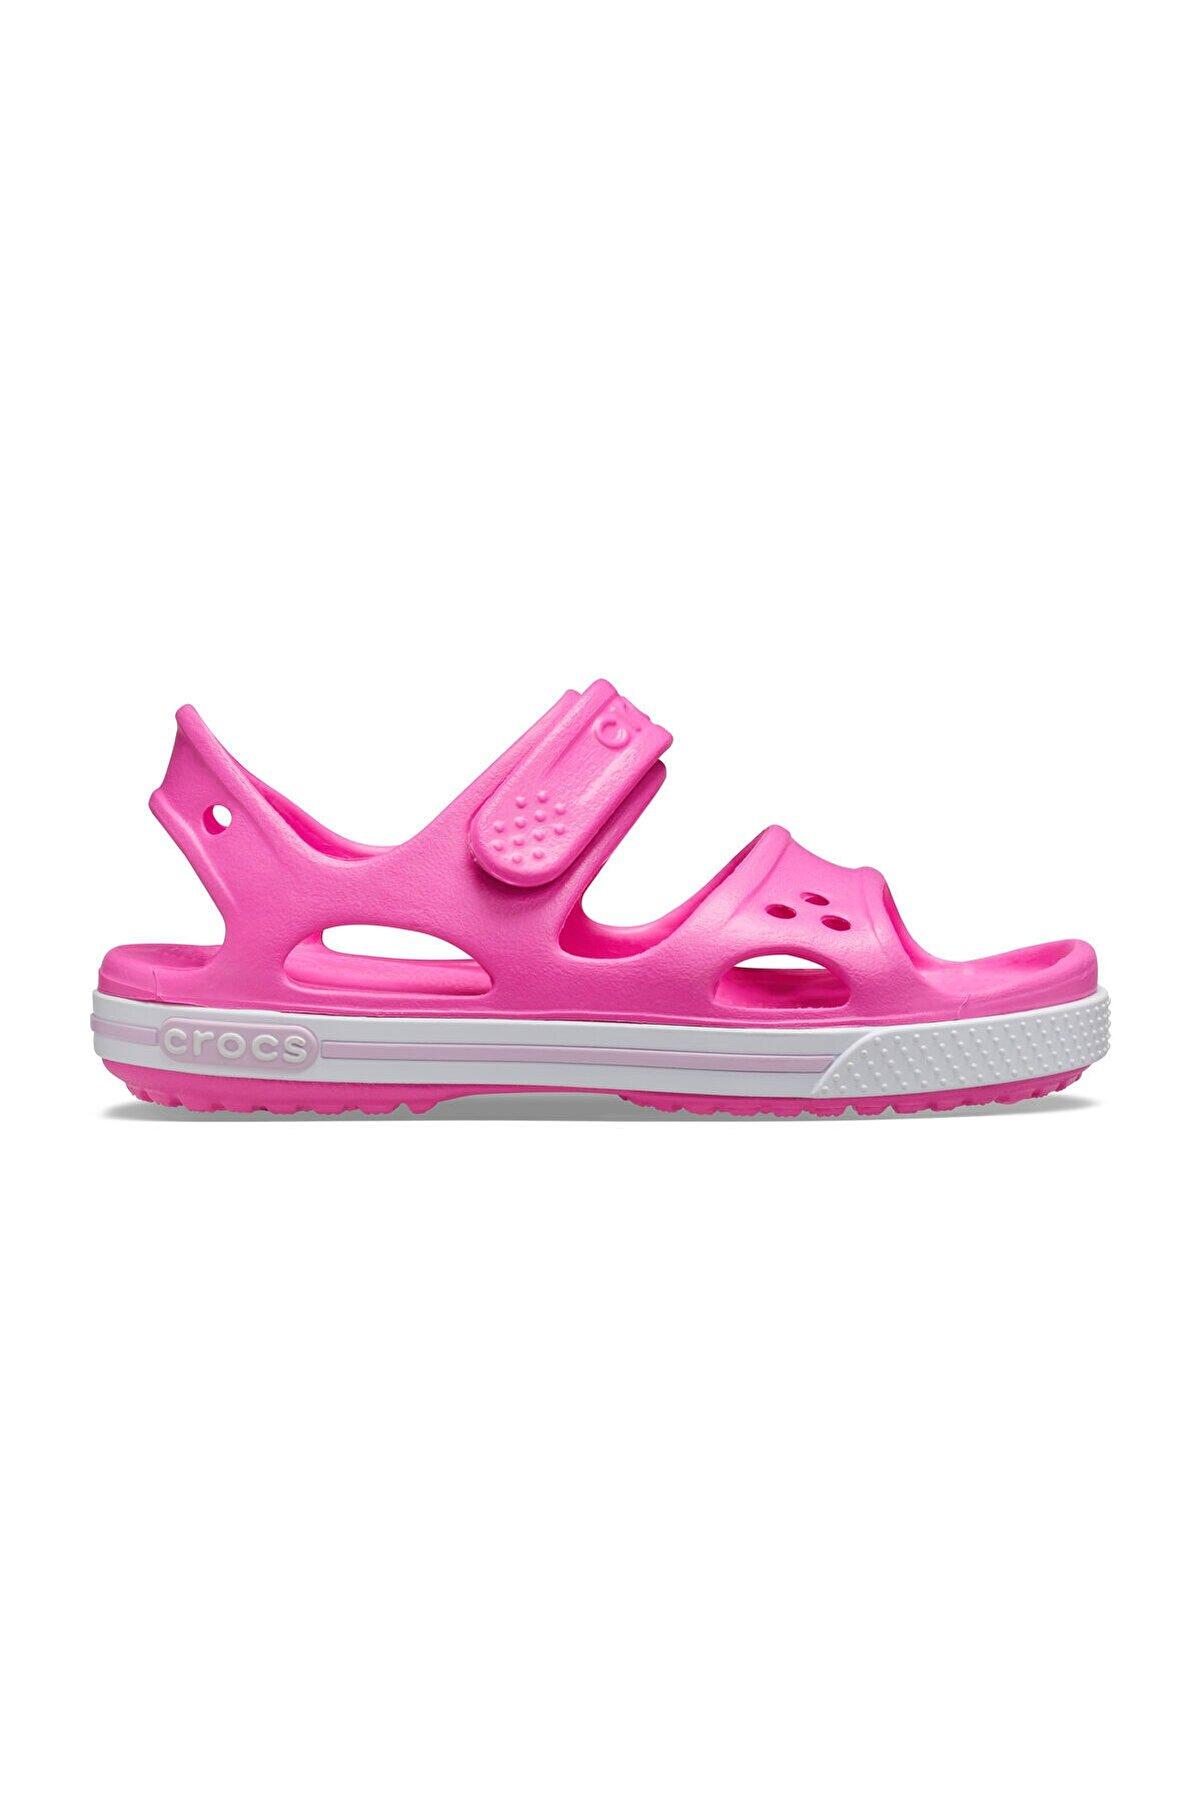 Crocs Crocband II Sandal PS Pembe Çocuk Terlik Sandalet